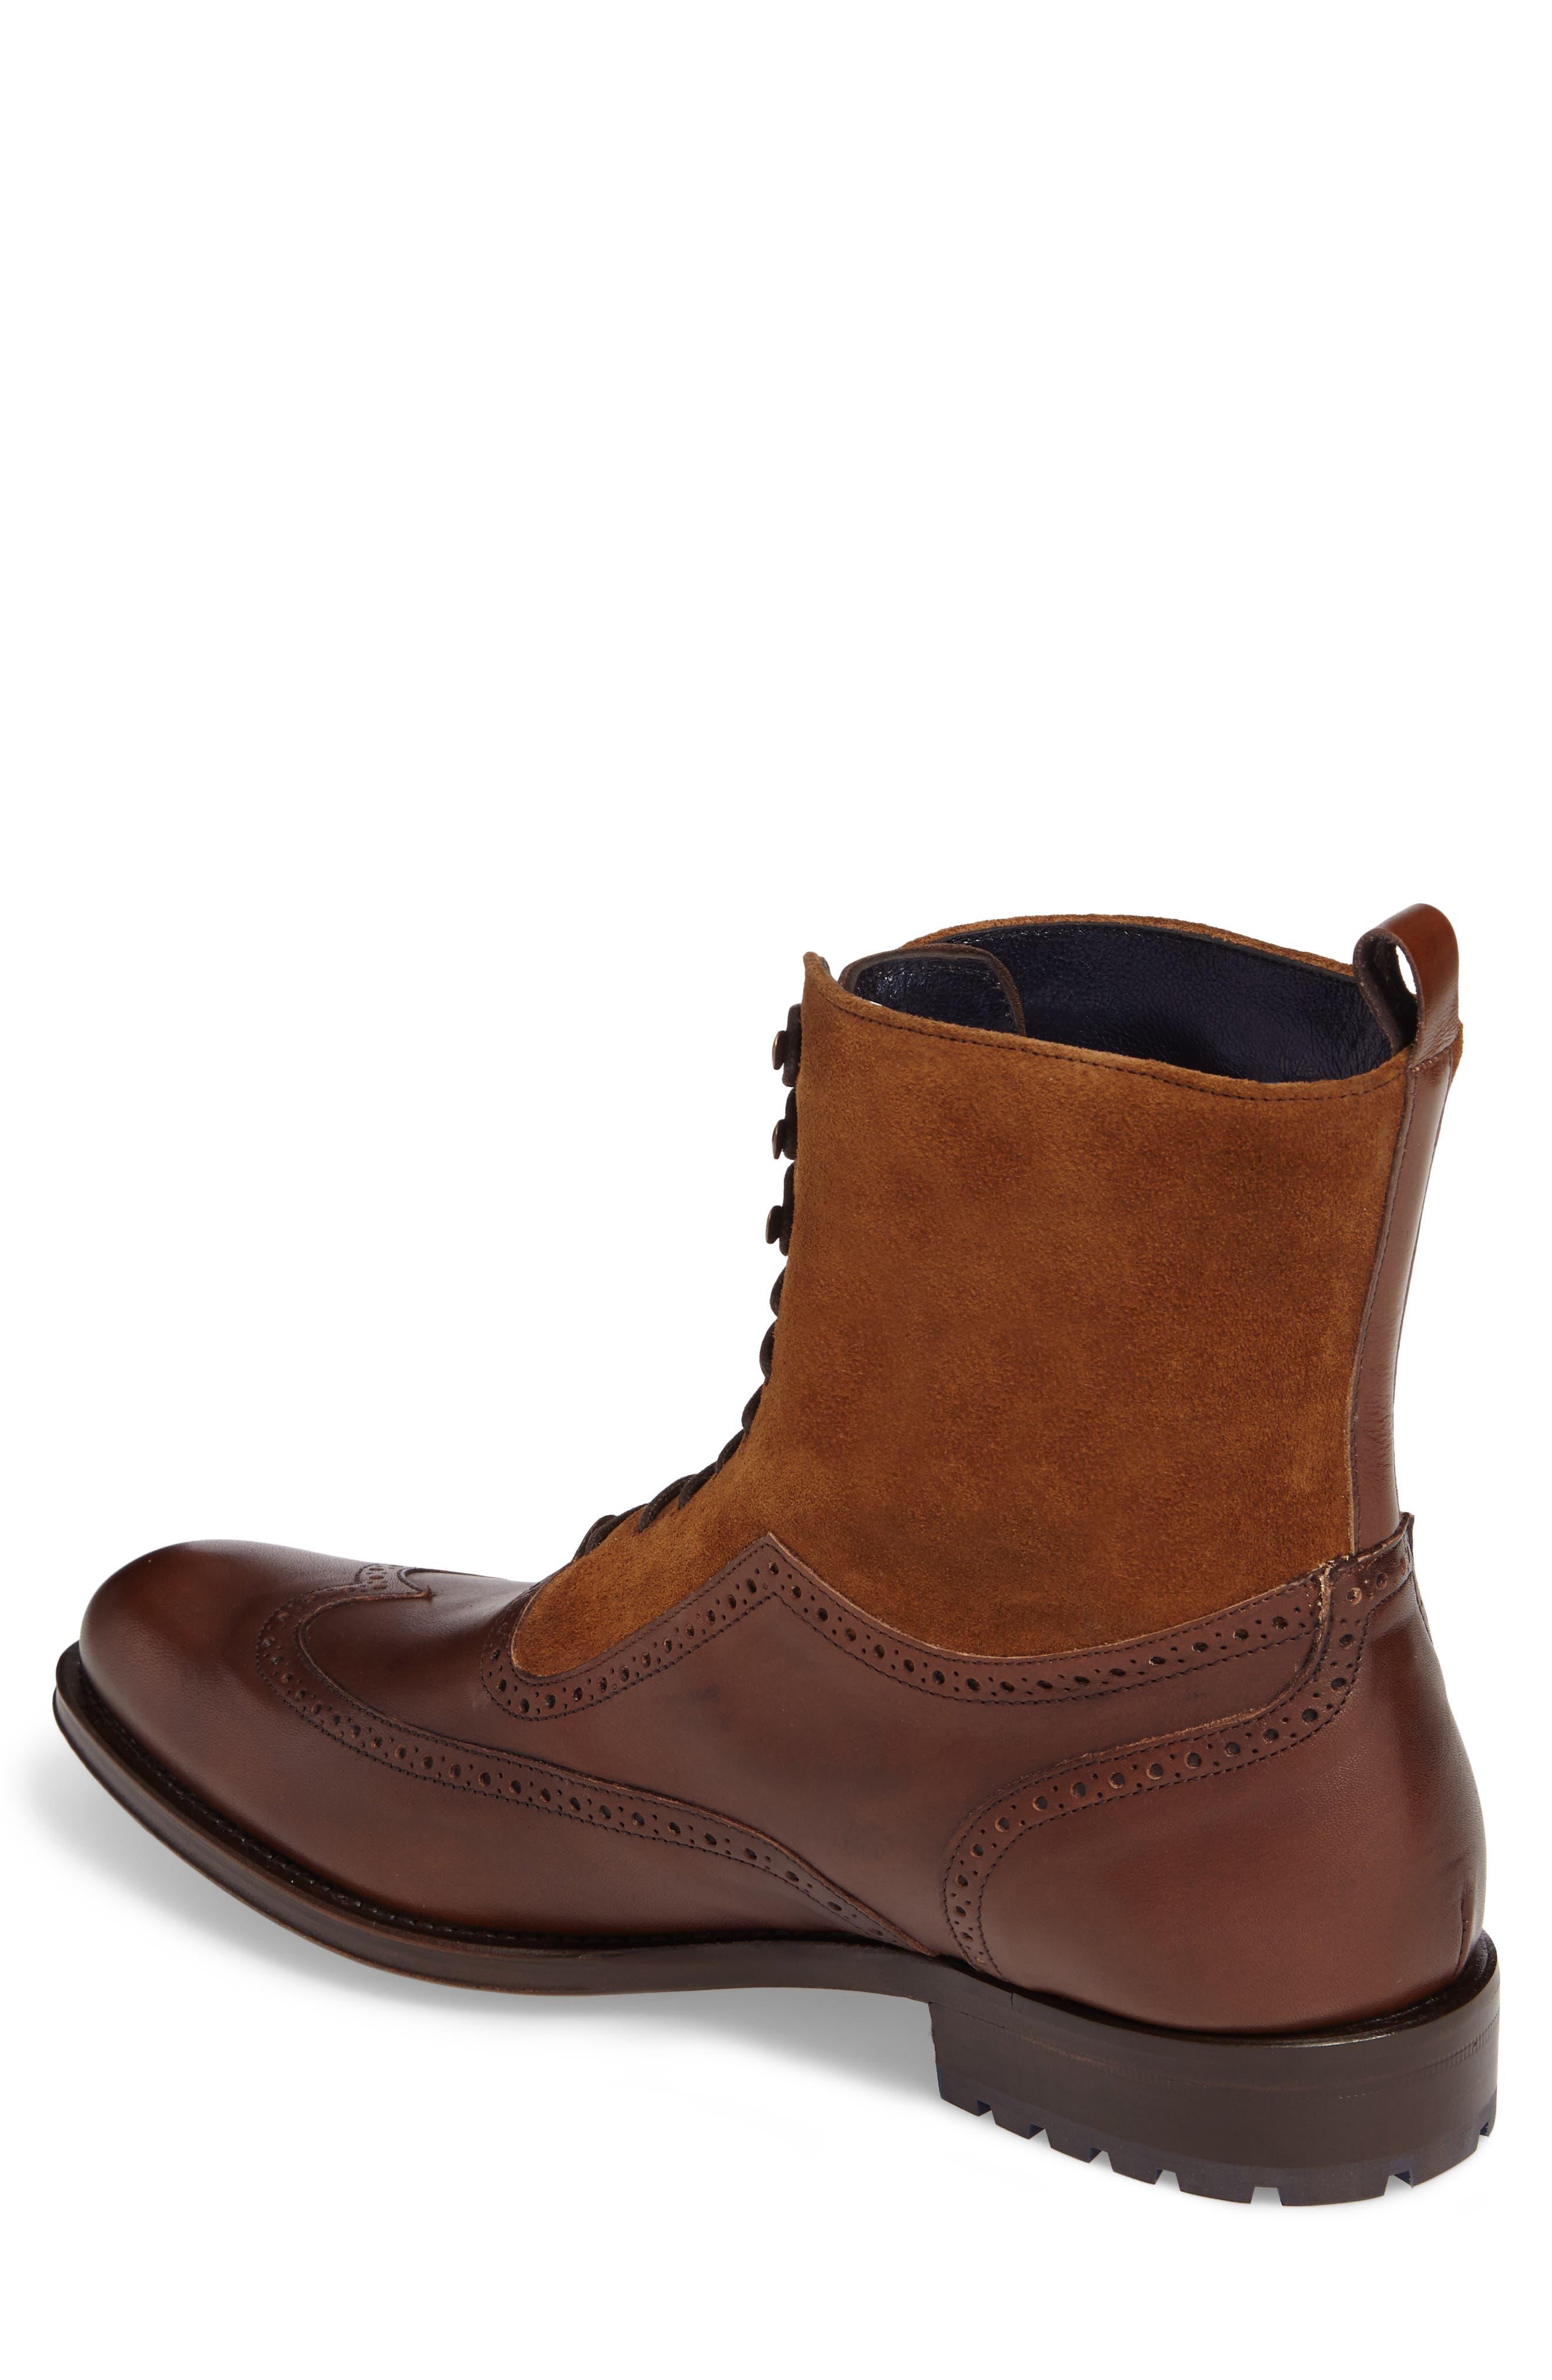 Alternate Image 2  - Mezlan Benalva Wingtip Boot (Men)